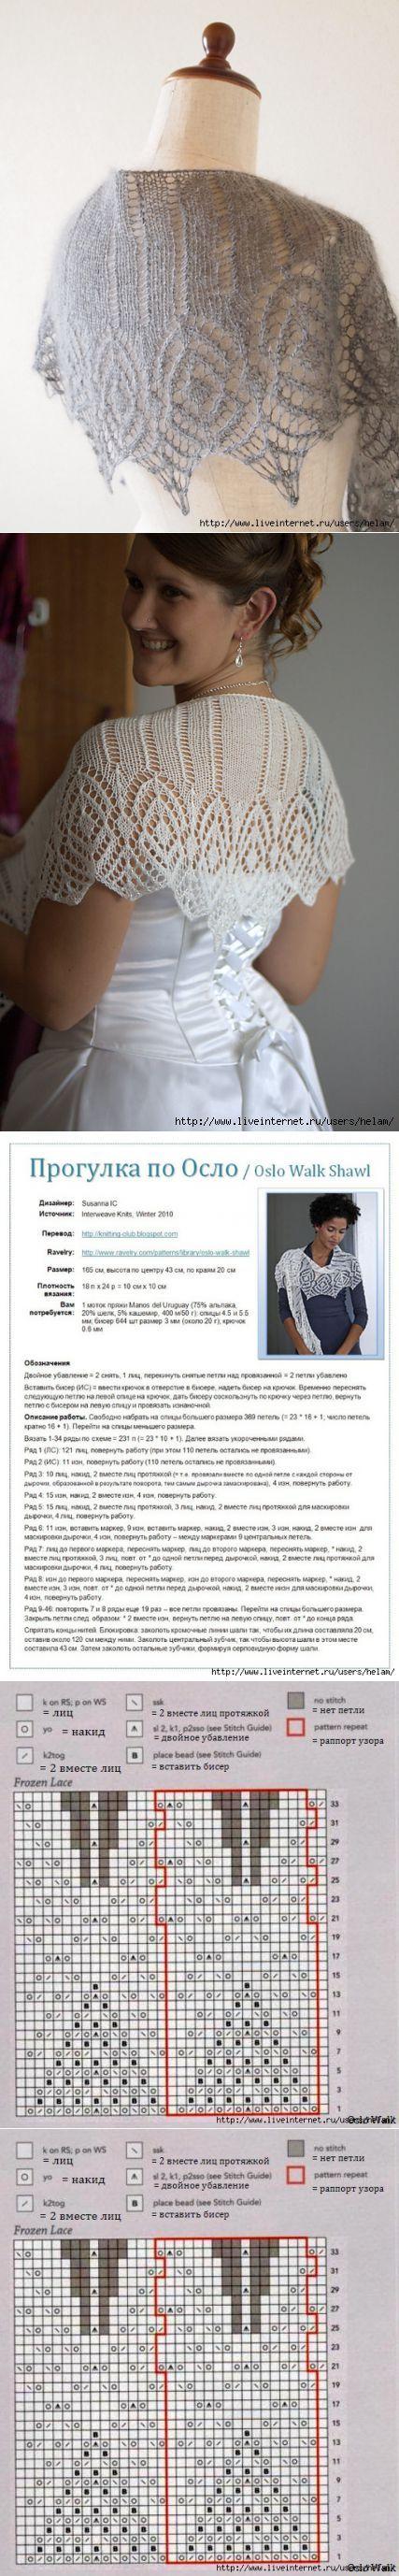 Шаль 'Прогулка по Осло' (Oslo Walk Shawl).